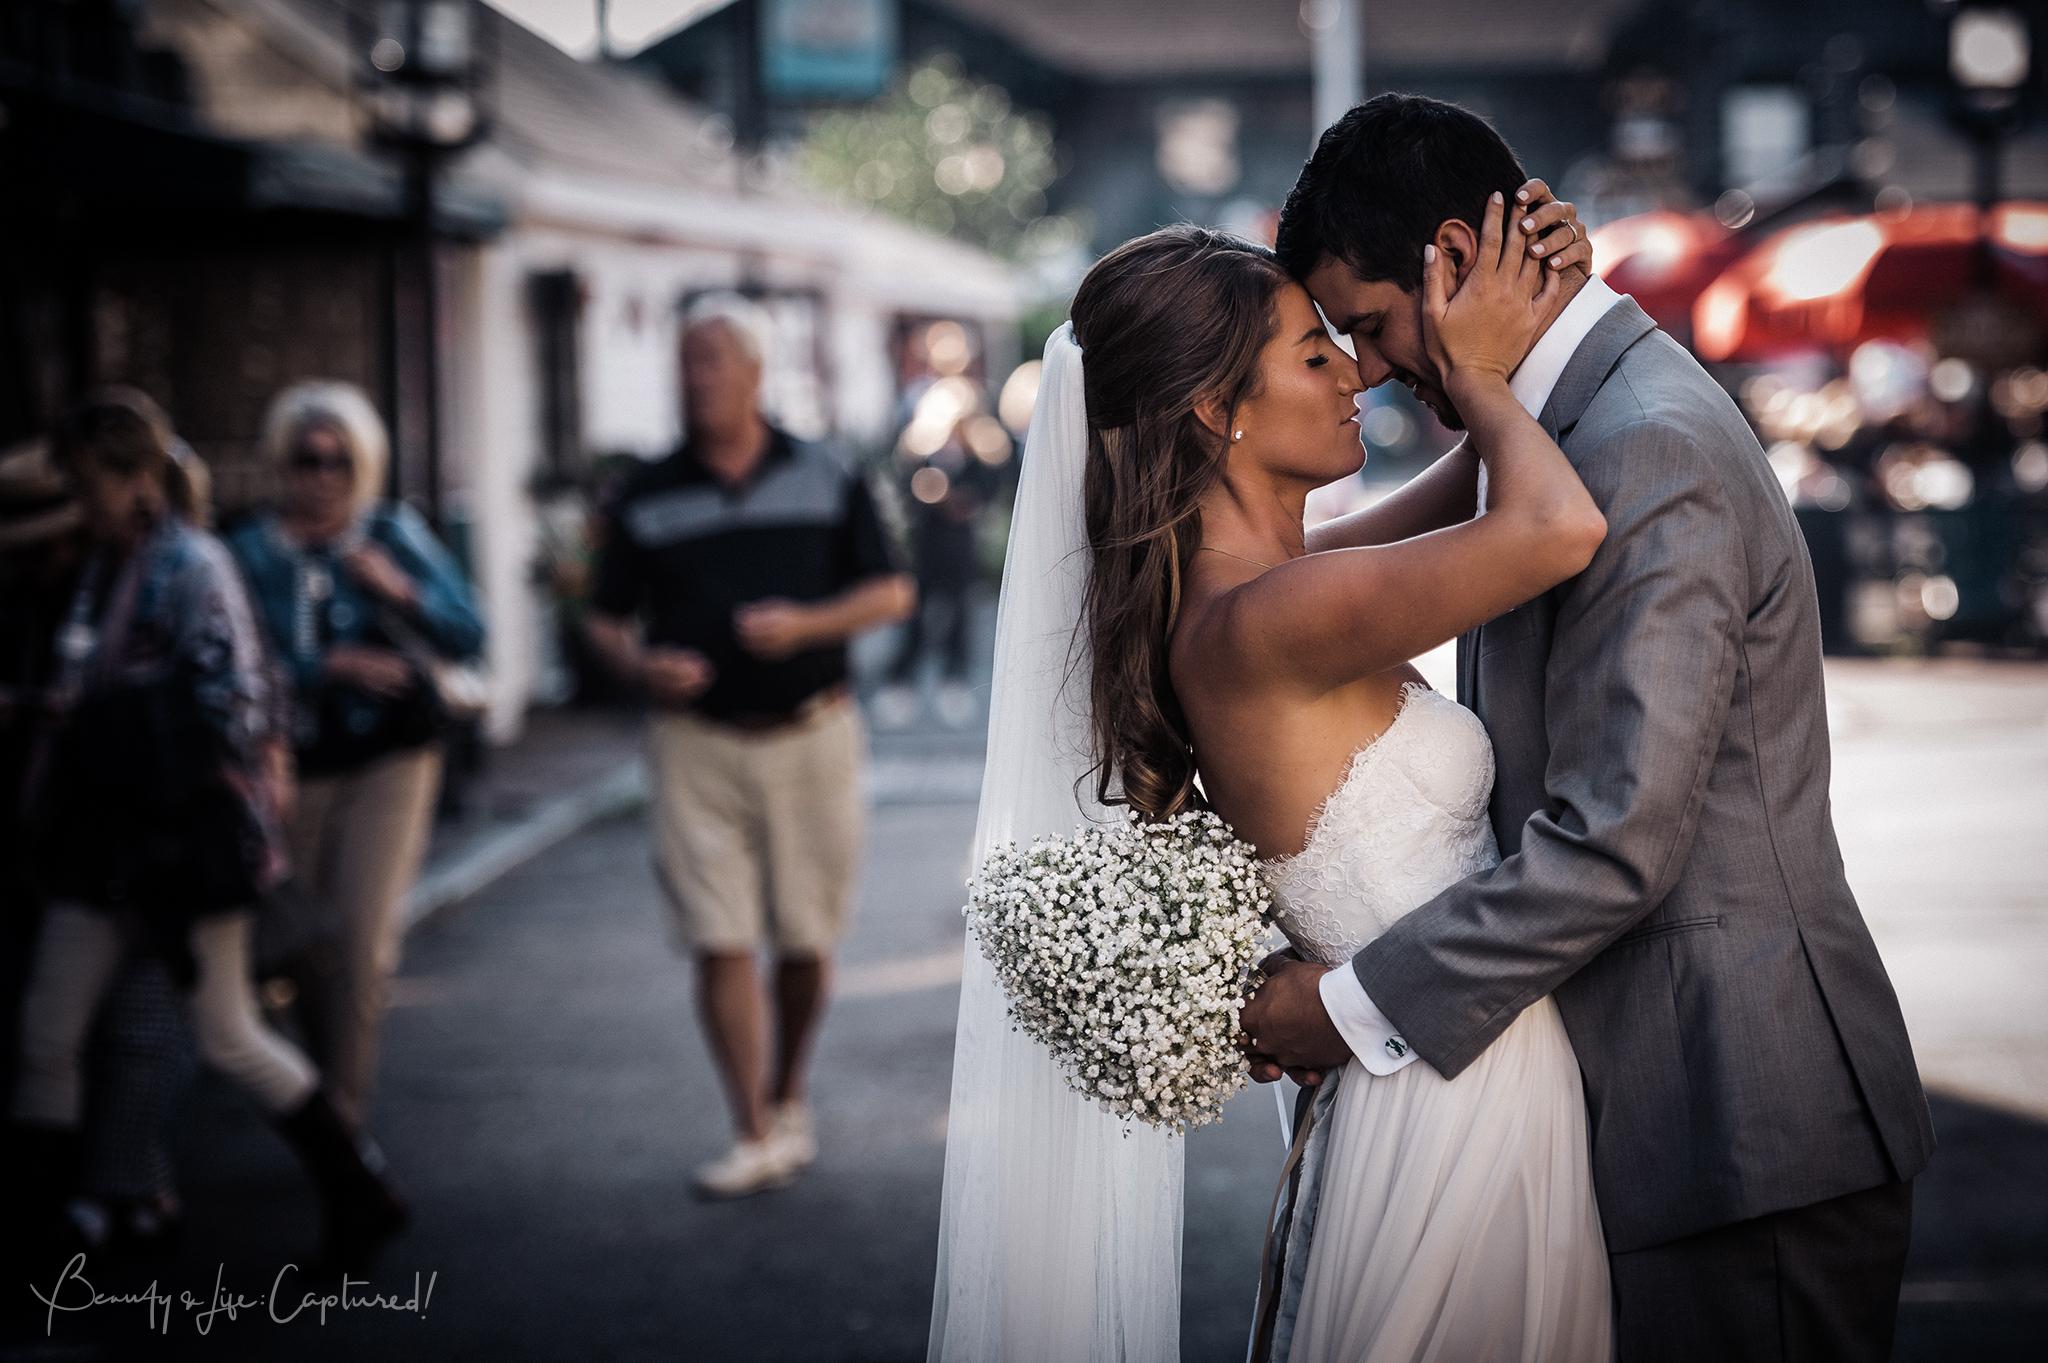 Beauty_and_Life_Captured_Athena_Wedding-8.jpg